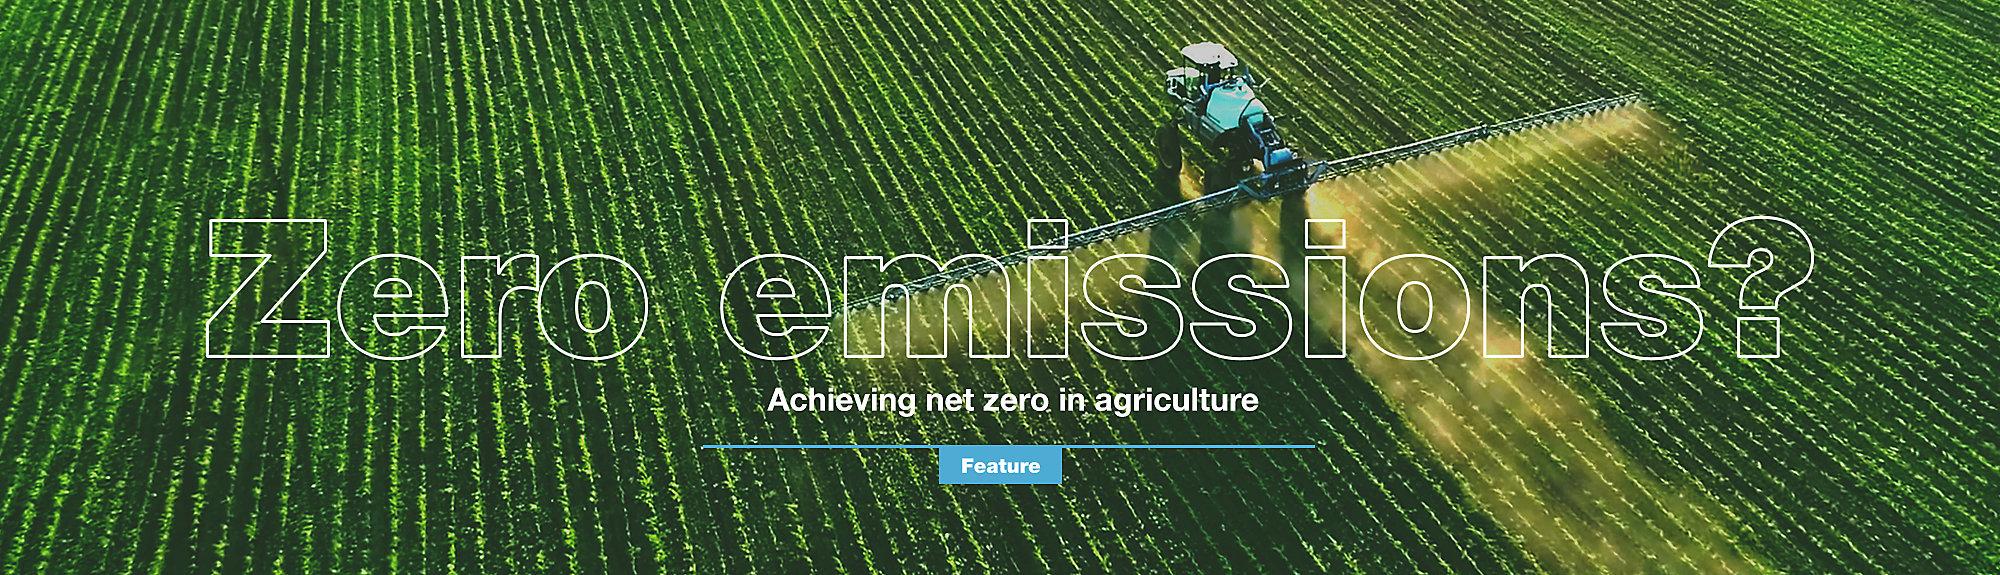 Achieving net zero in agriculture